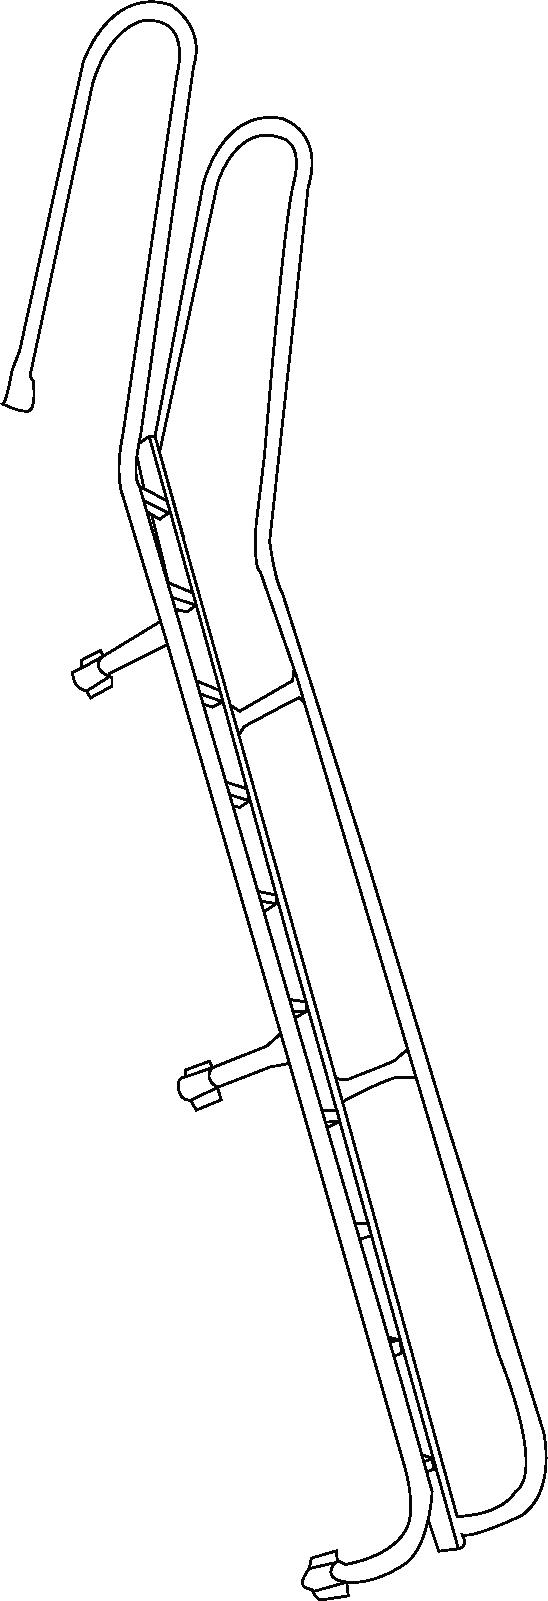 handrail-01.png